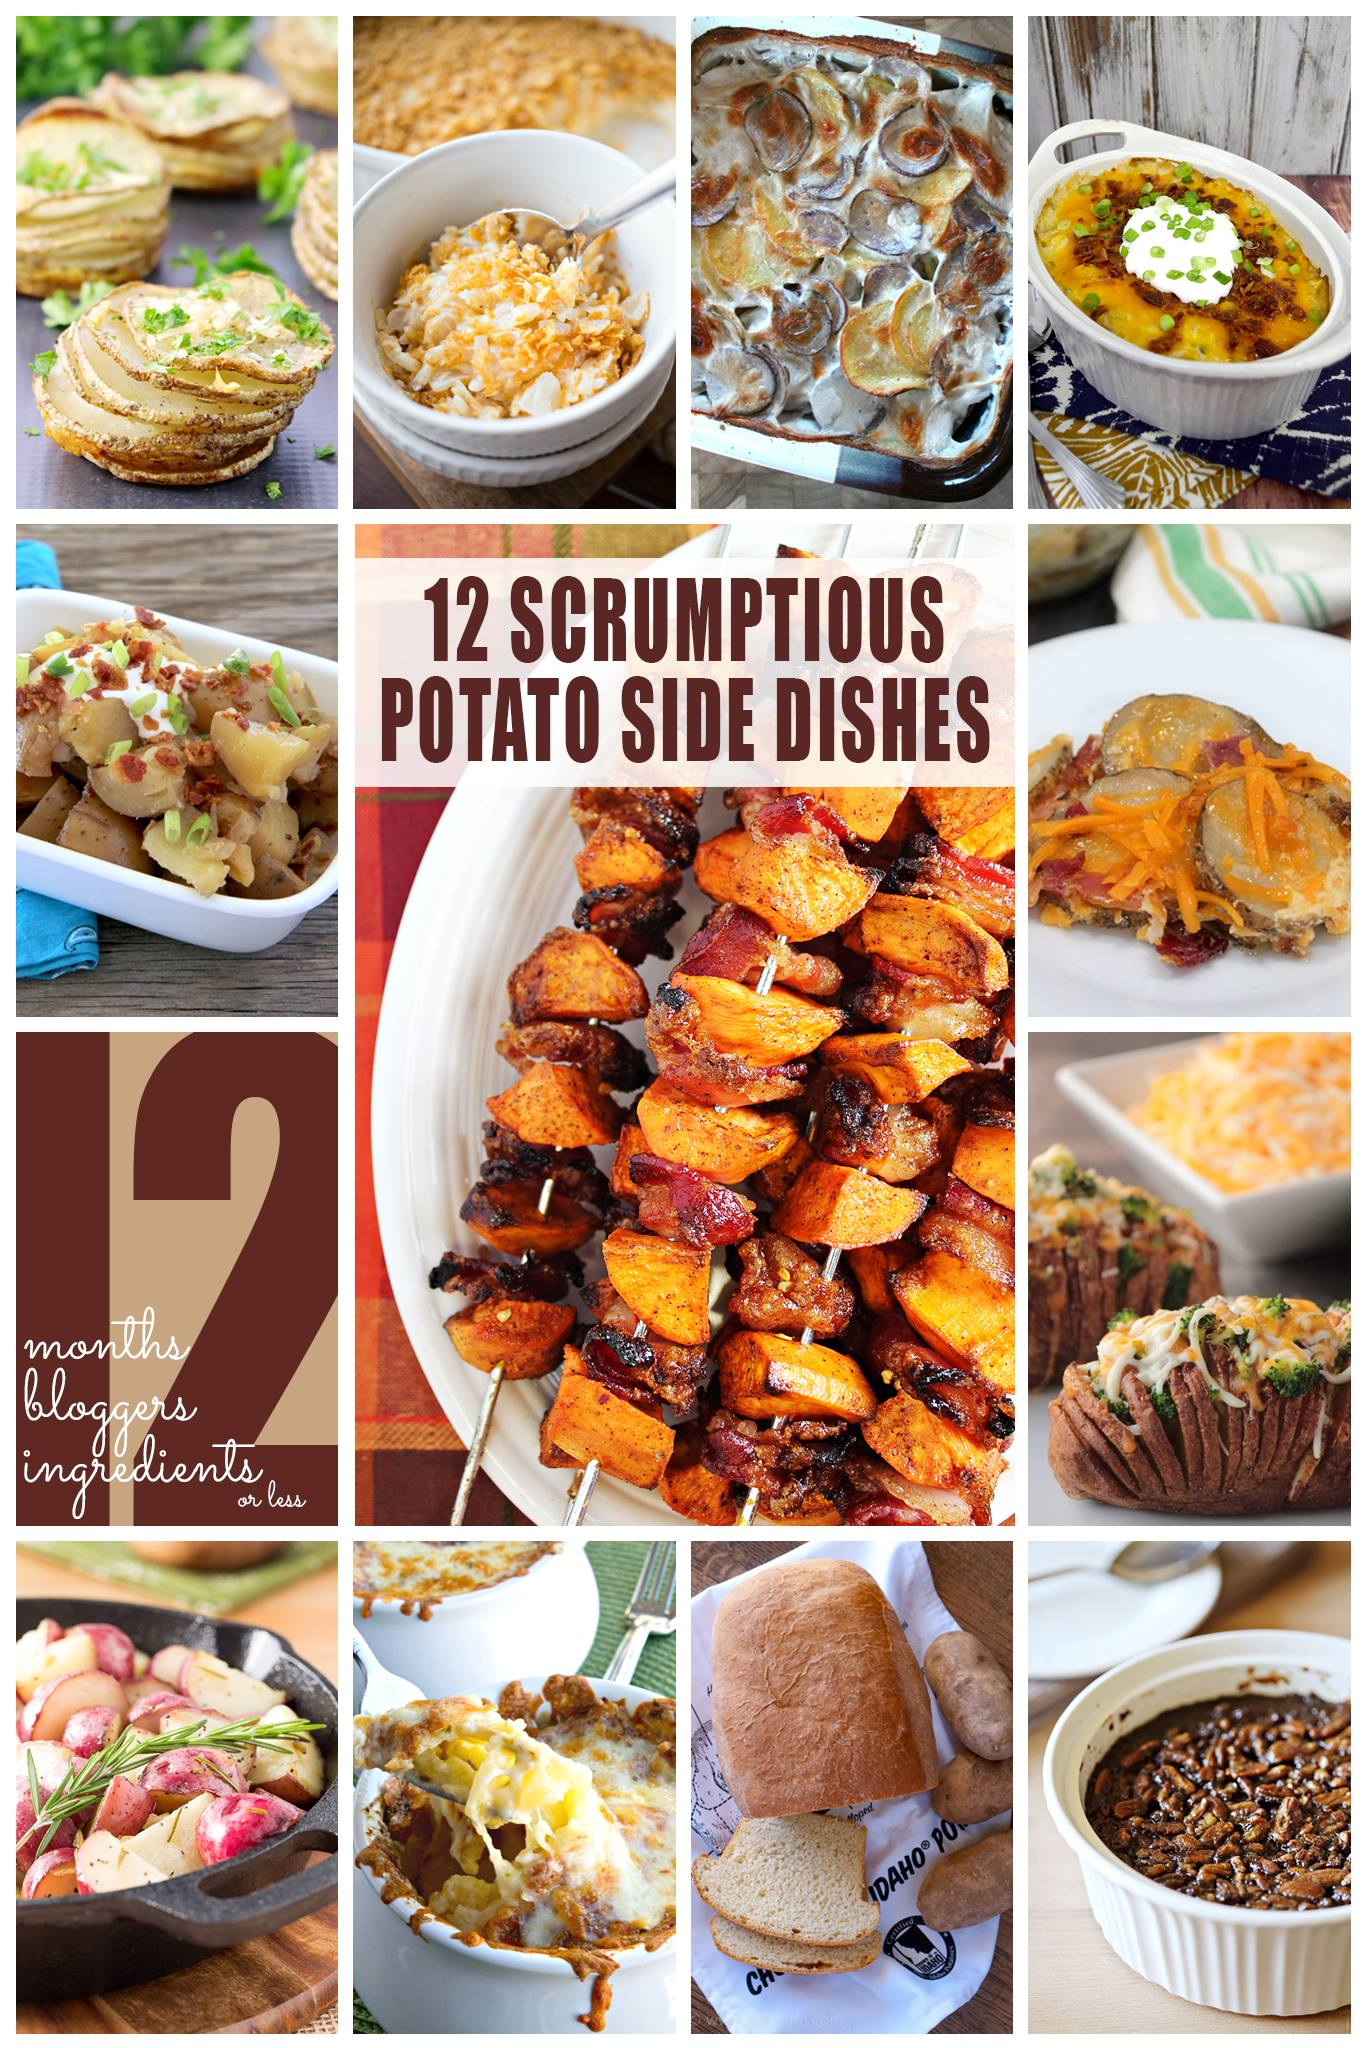 12 Scrumptious Potato Side Dishes | anightowlblog.com